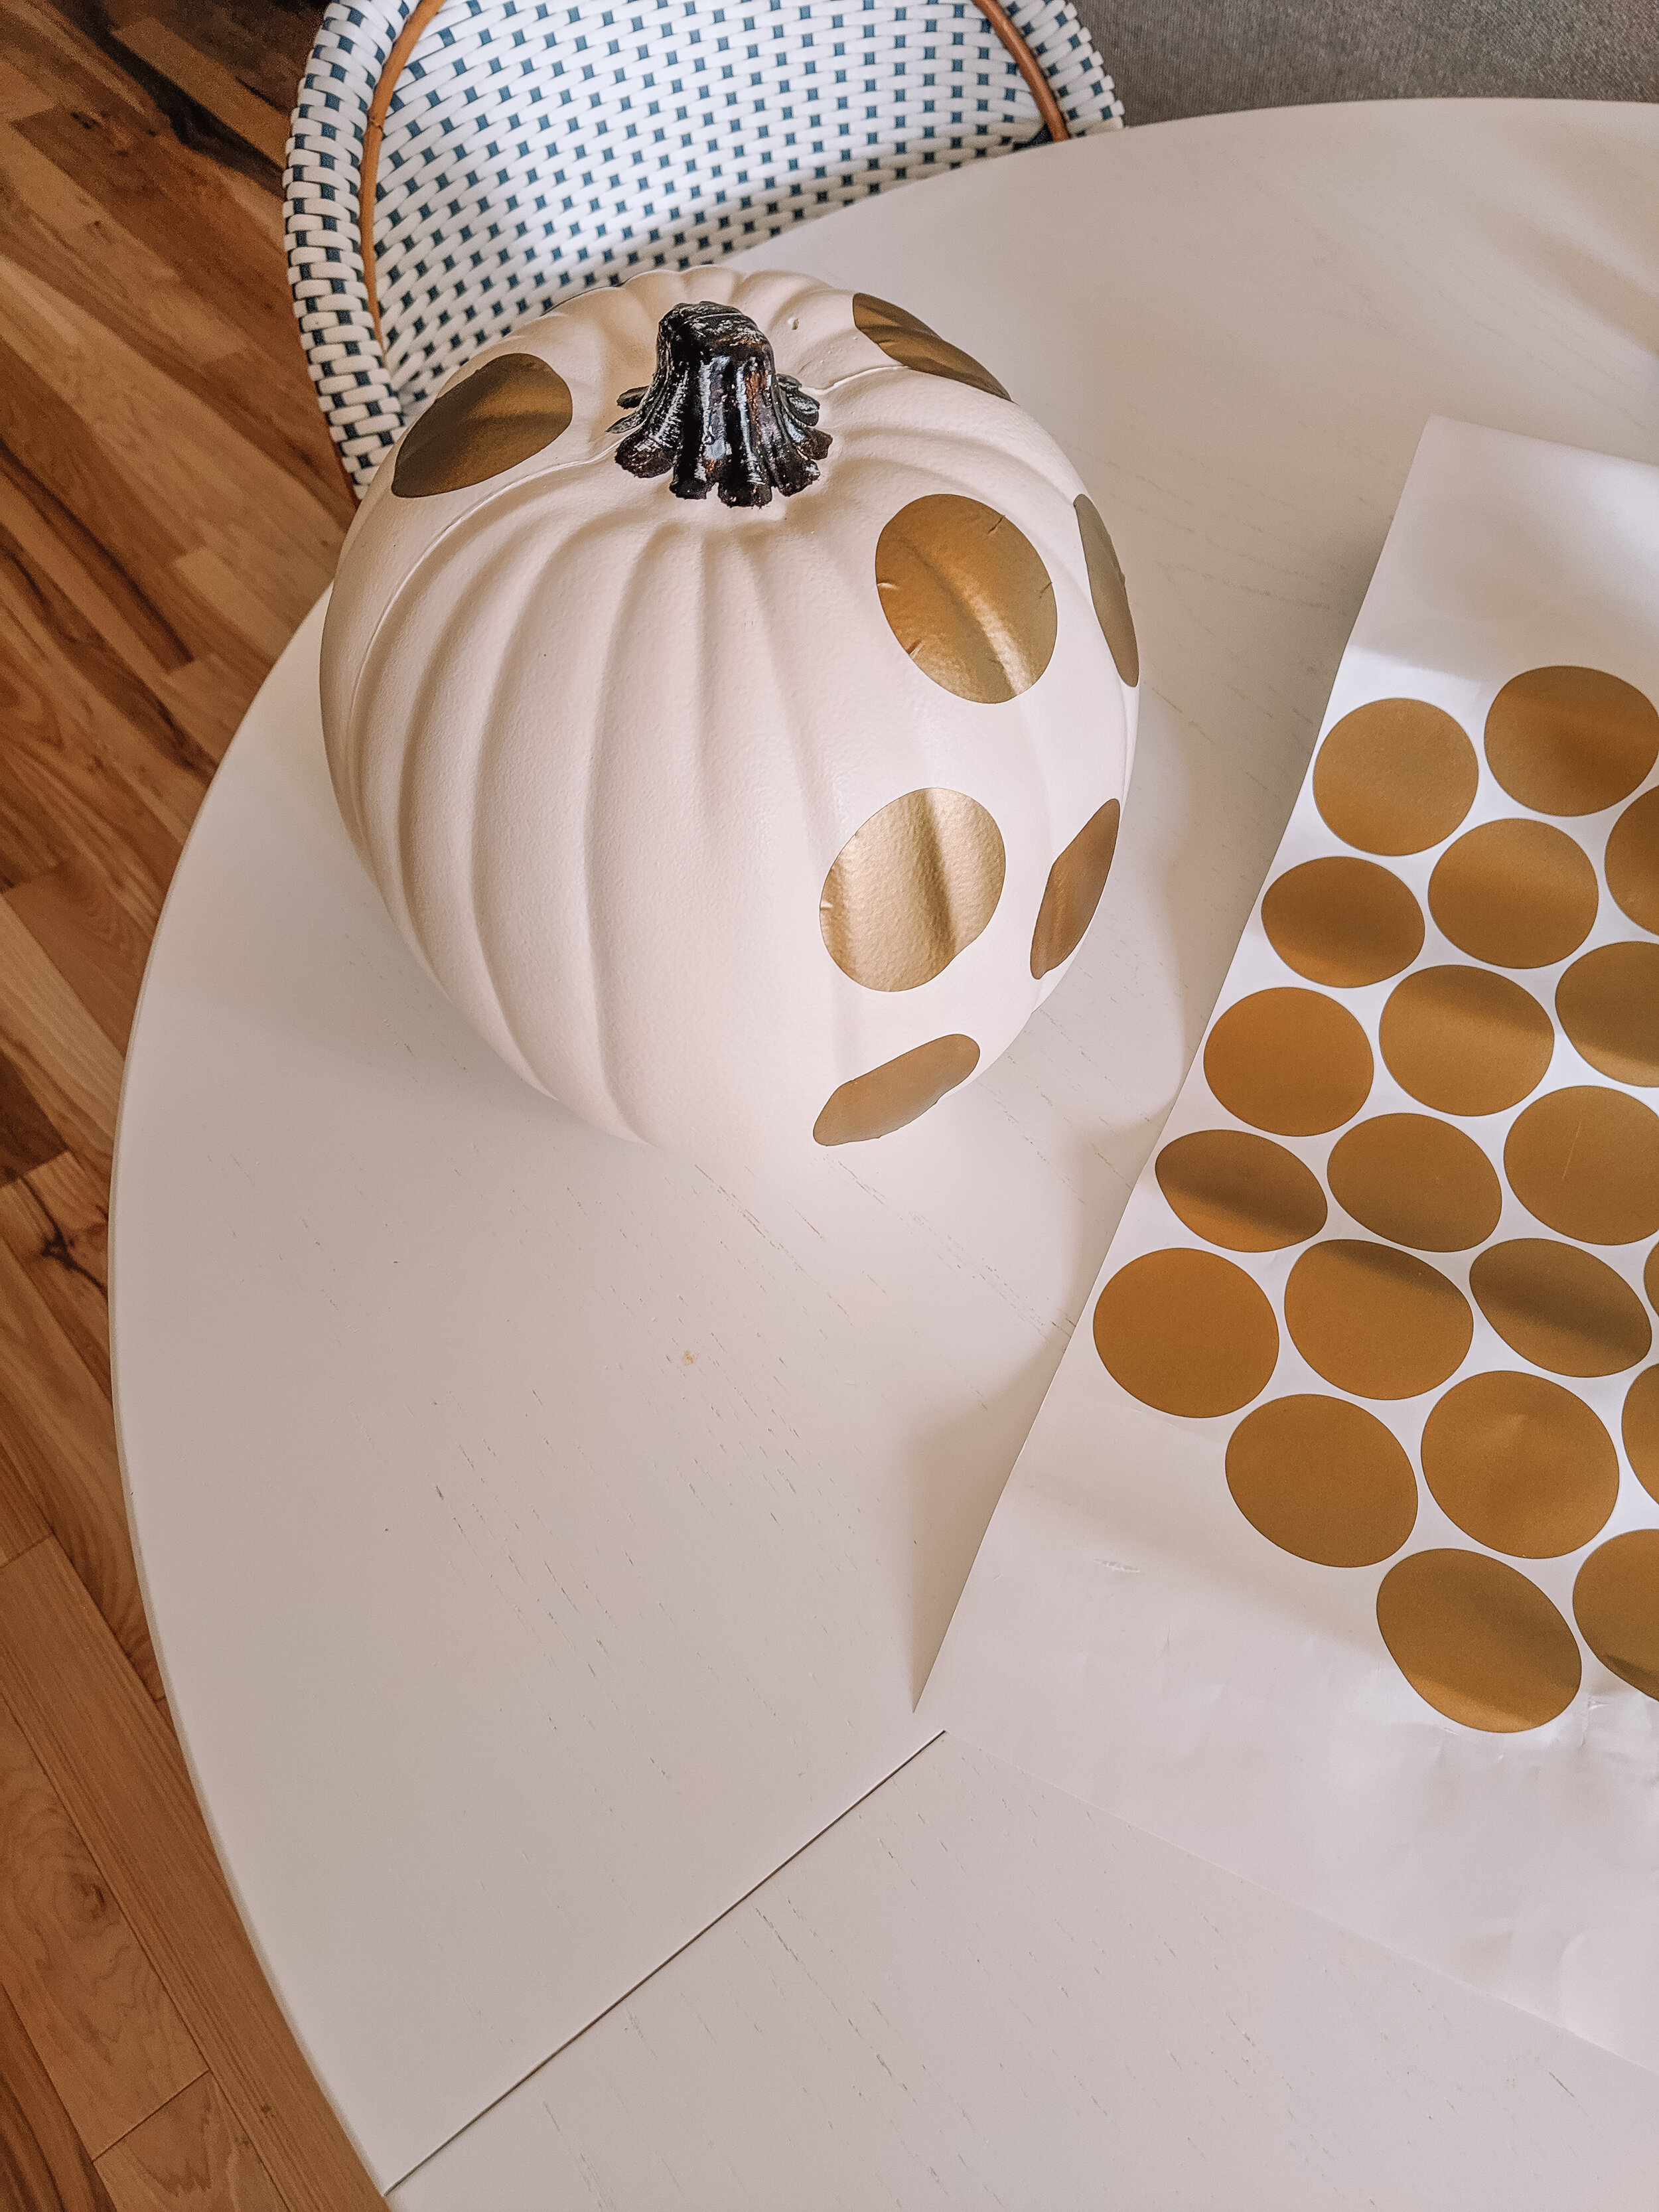 Pumpkin Decorating DIY - White with Gold Polka Dots